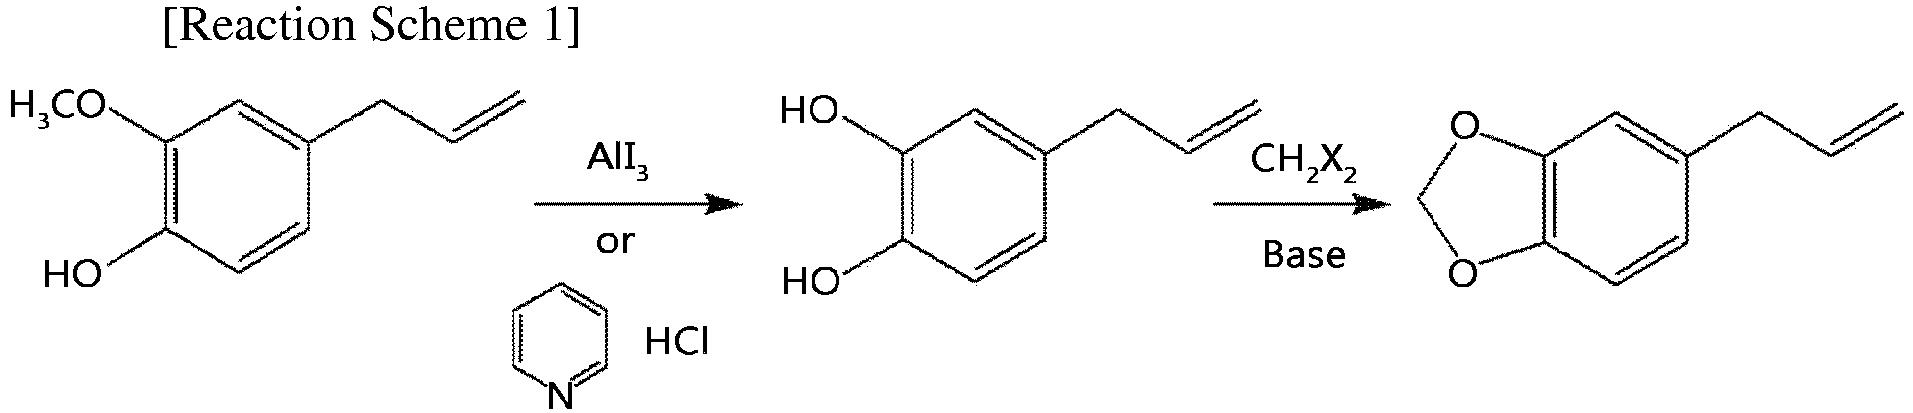 EP3061448A1 - Composition containing eugenol as active